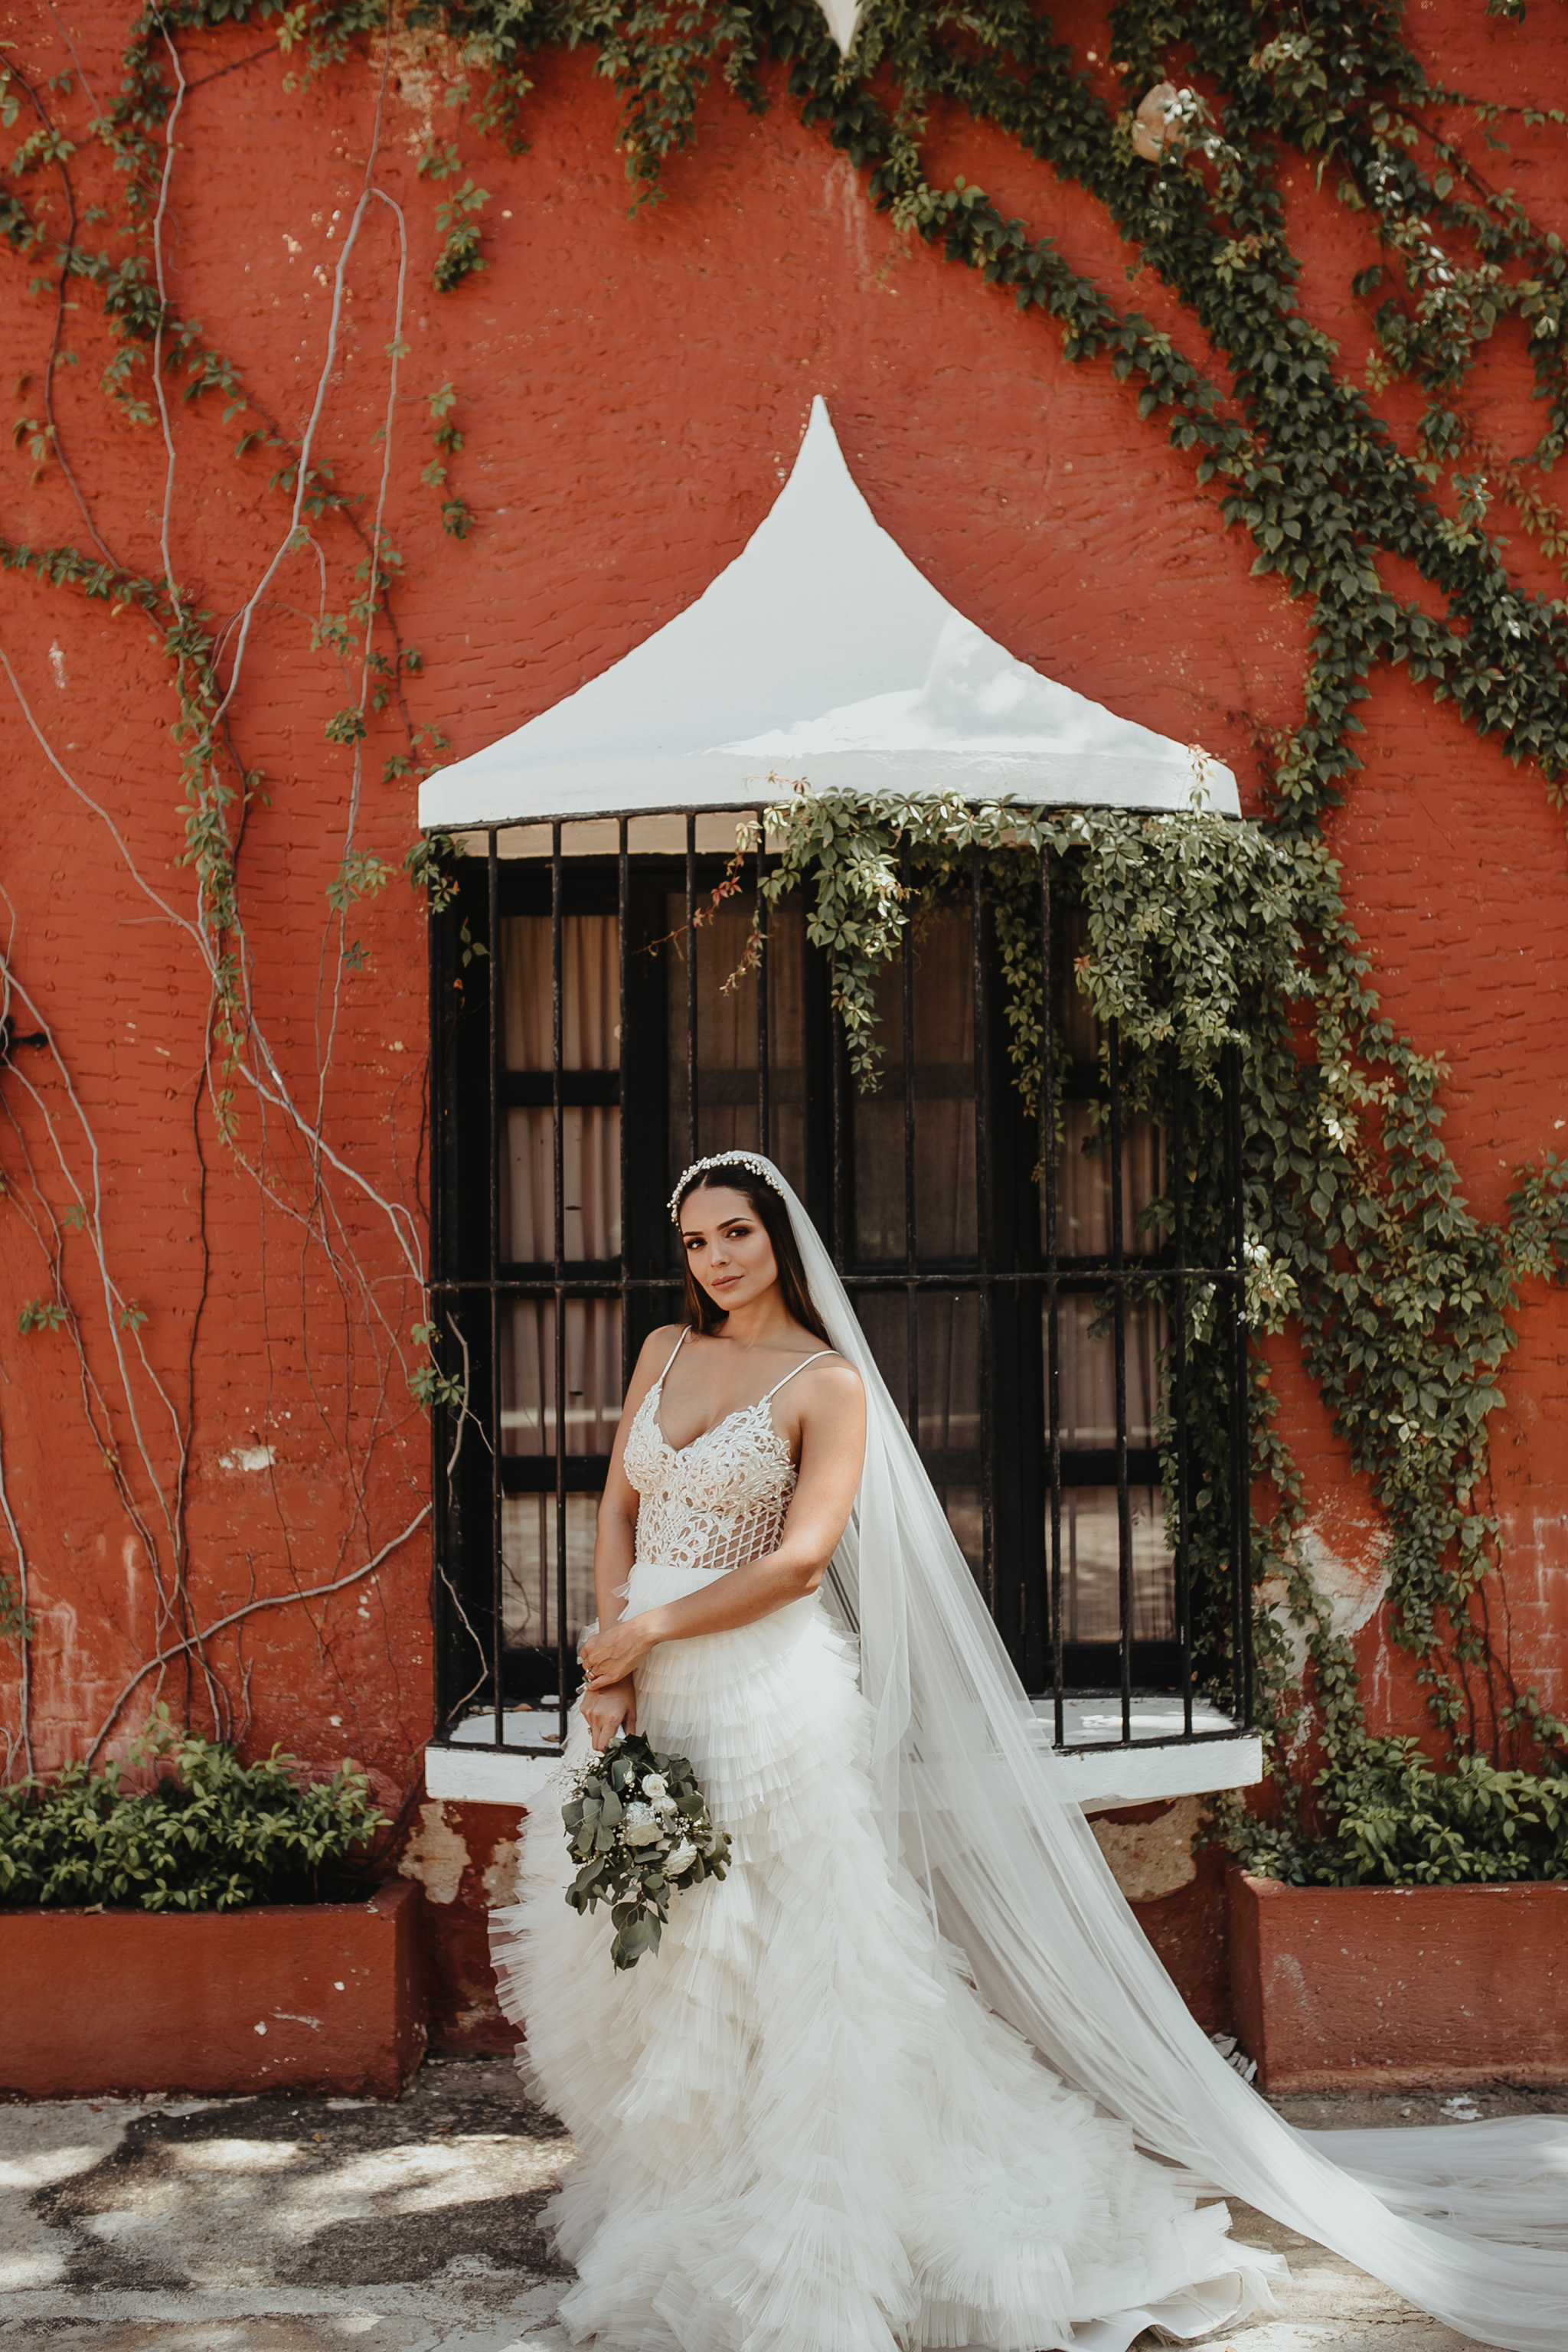 0156R&F__WeddingDestination_Weddingmerida_BodaMexico_FotografoDeBodas_FabrizioSimoneenFotografo.jpg